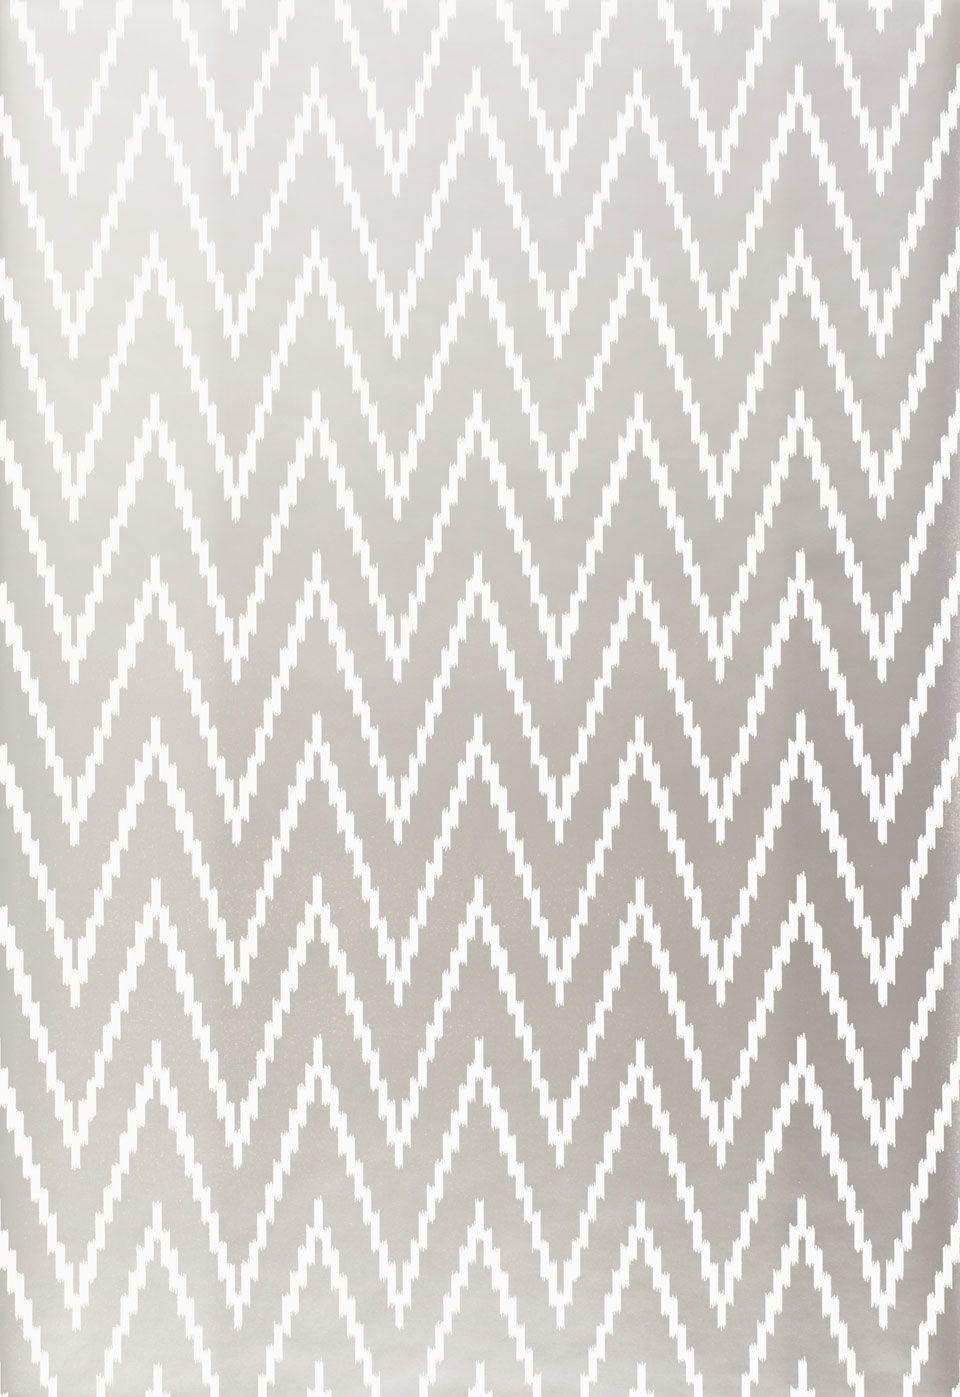 Wallcovering / Wallpaper | Kasari Ikat in Silver | Schumacher